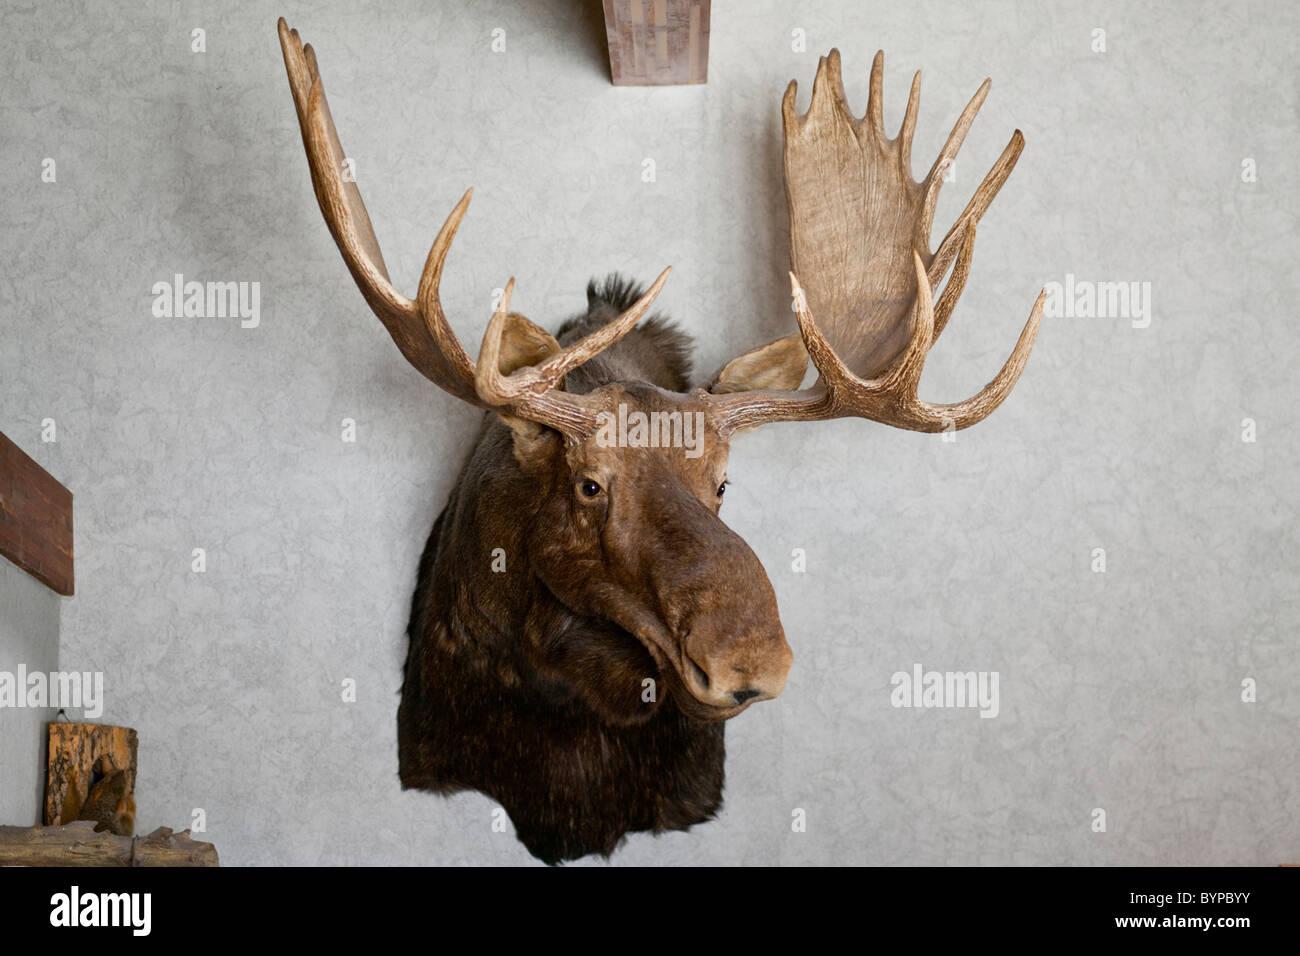 USA, North Dakota, Belfield, Head and antlers of bull moose hanging